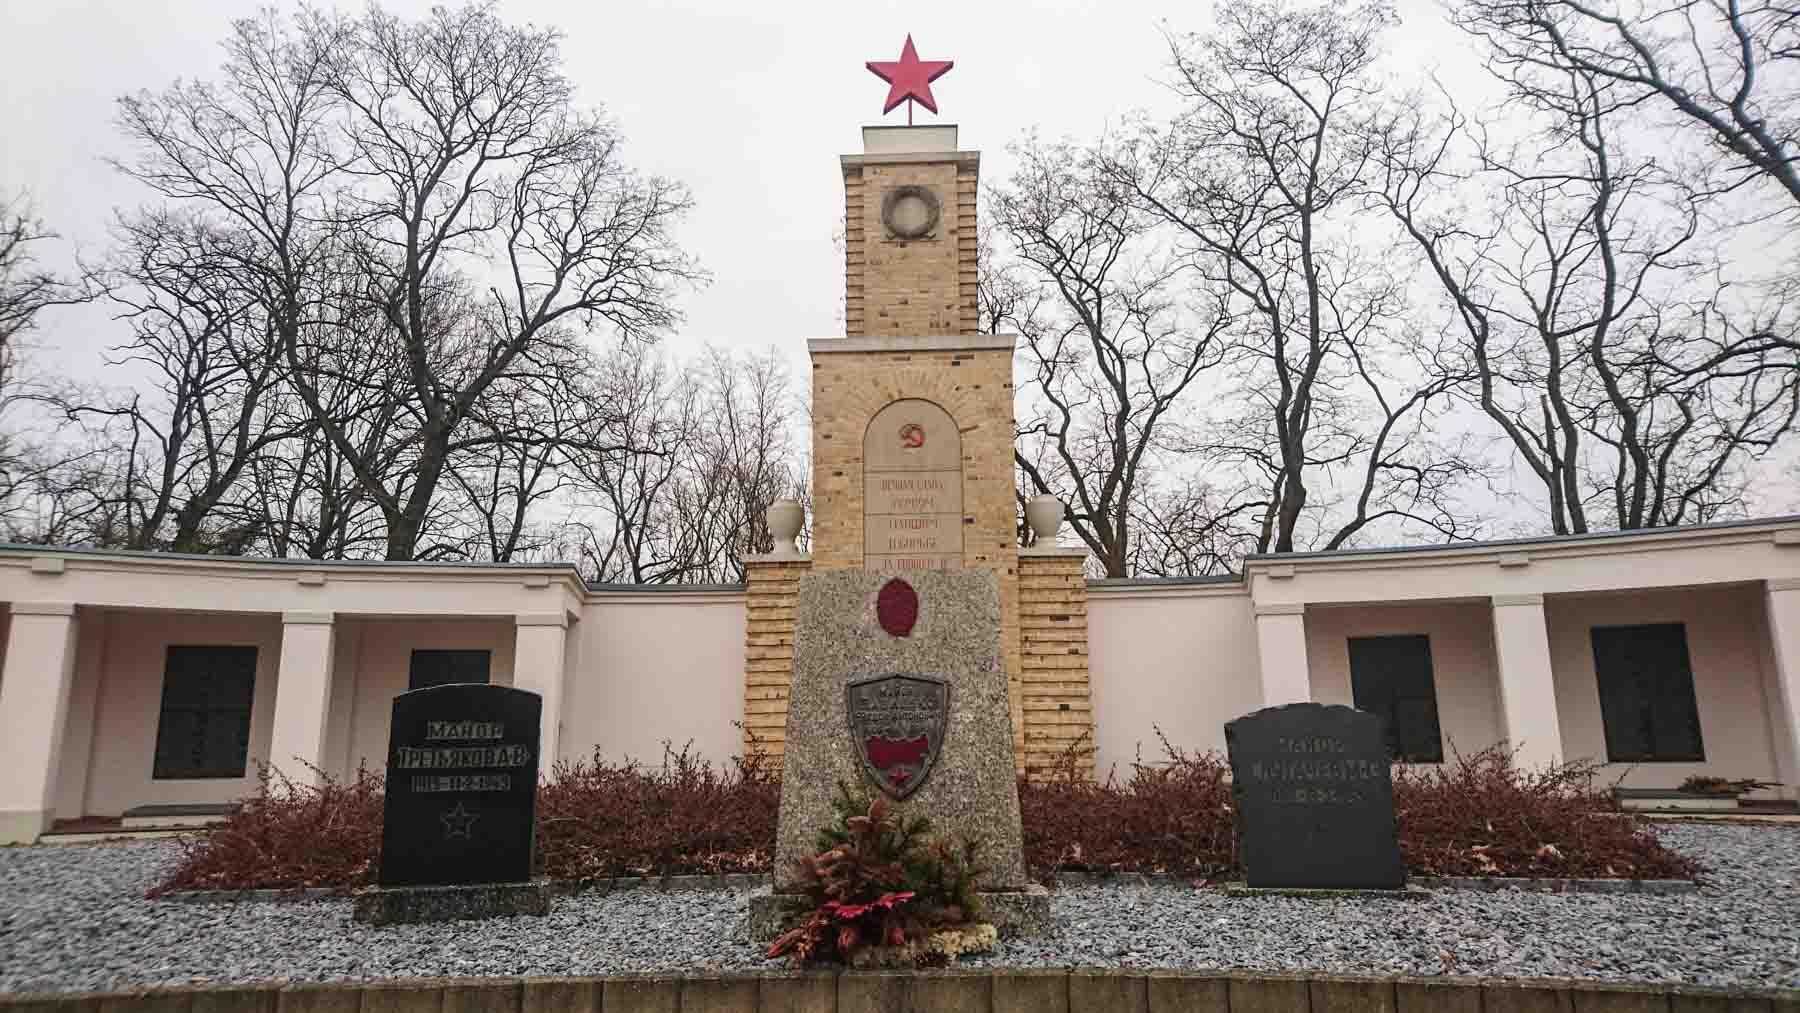 Russischer Soldatenfriedhof Lebus